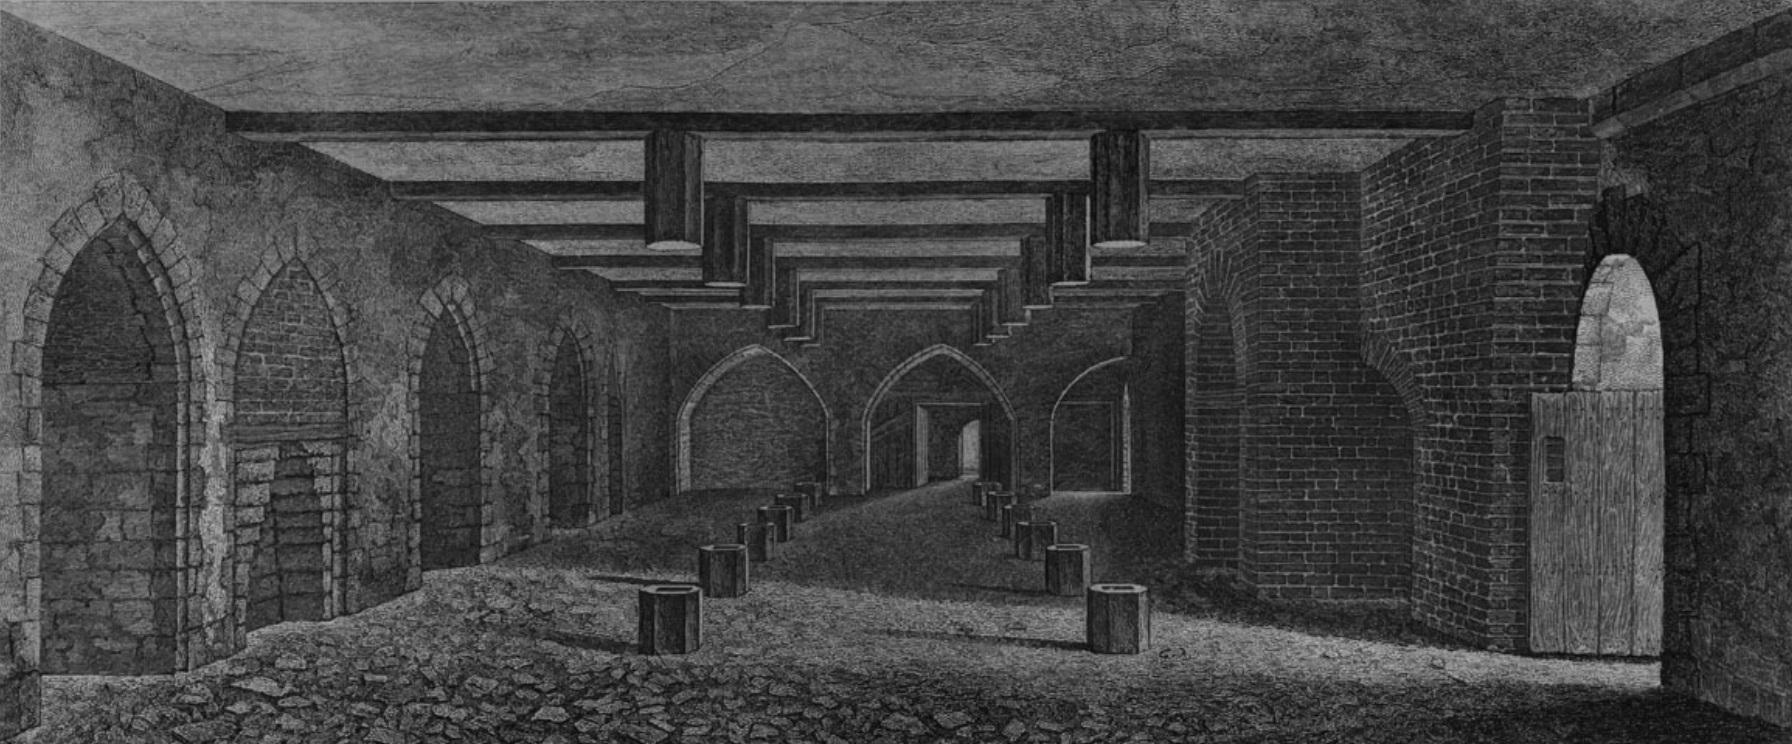 Description gunpowder plot parliament cellar